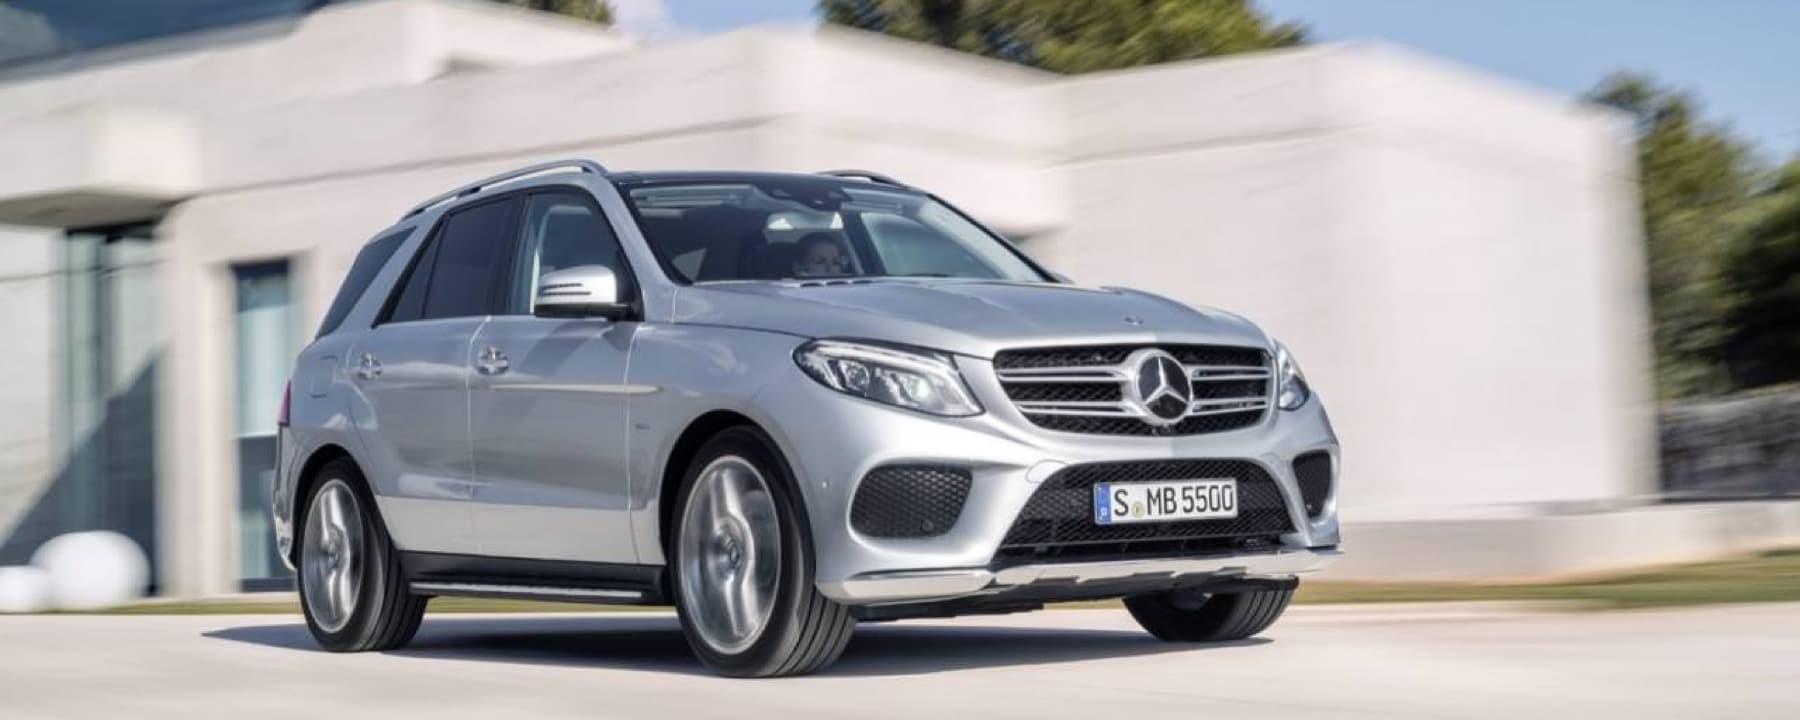 Mercedes benz usa introduces a new video mercedes benz for Mercedes benz official site usa